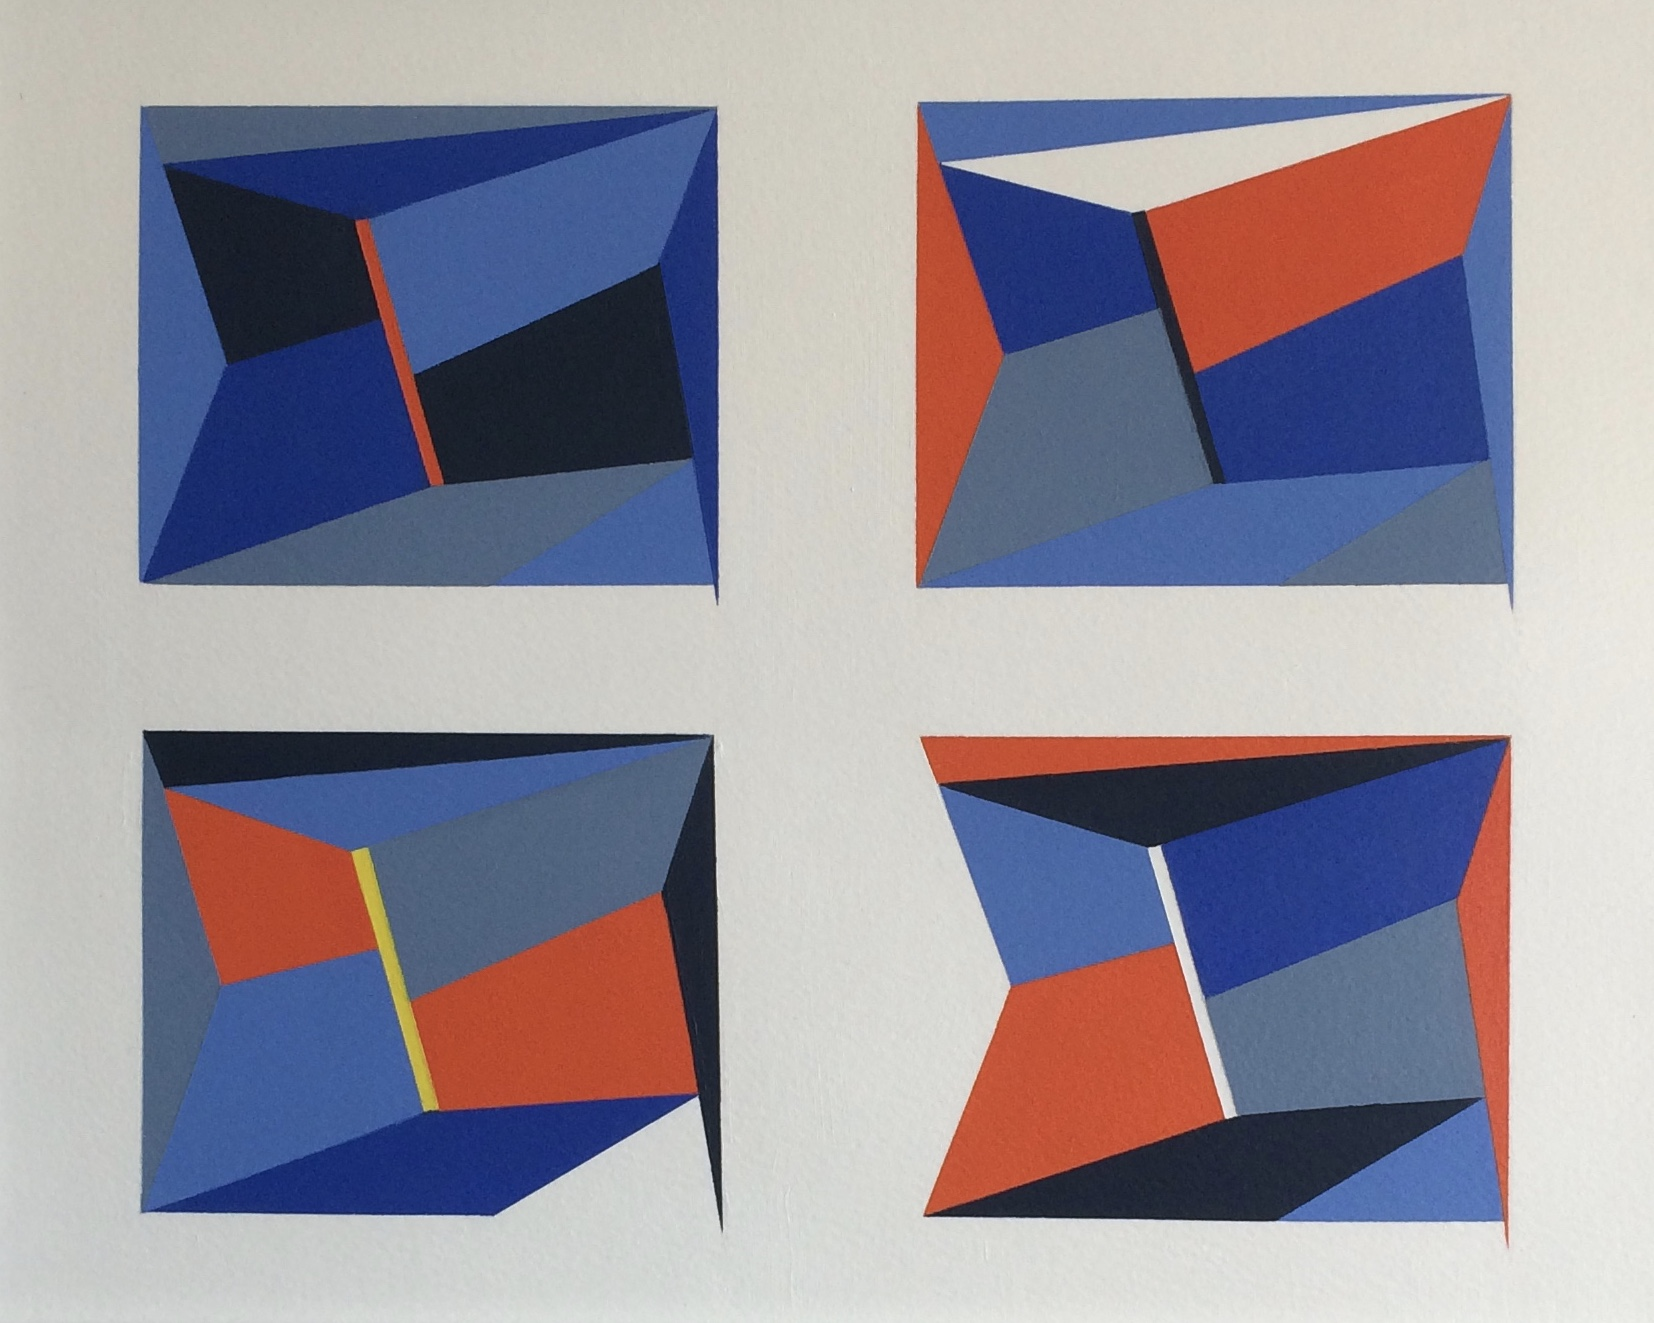 'Composition 4 x 4' (2020), Acrylic on Watercolour Paper (36 x 28cm)